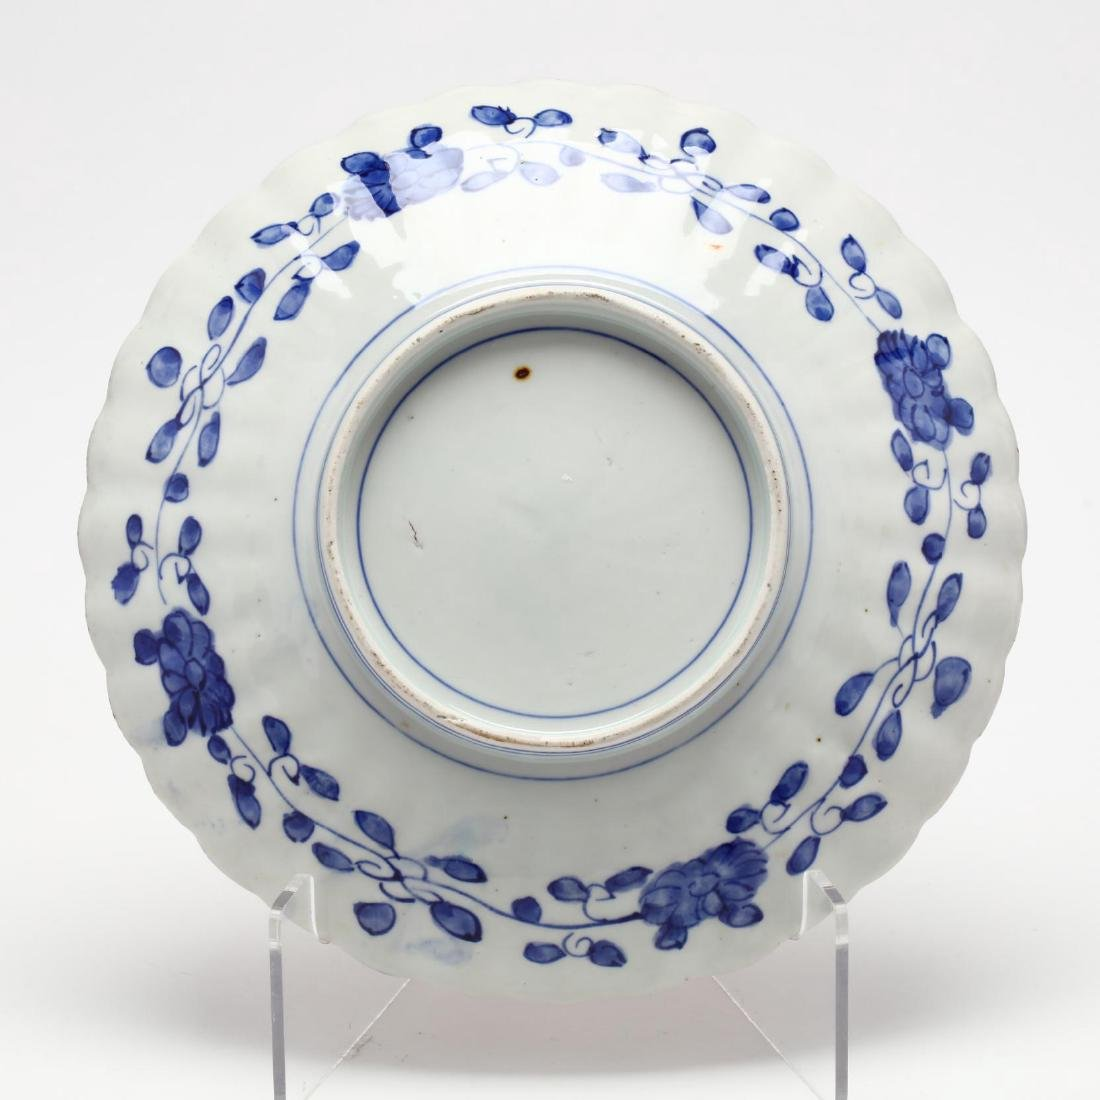 A Group of Imari Porcelain - 5